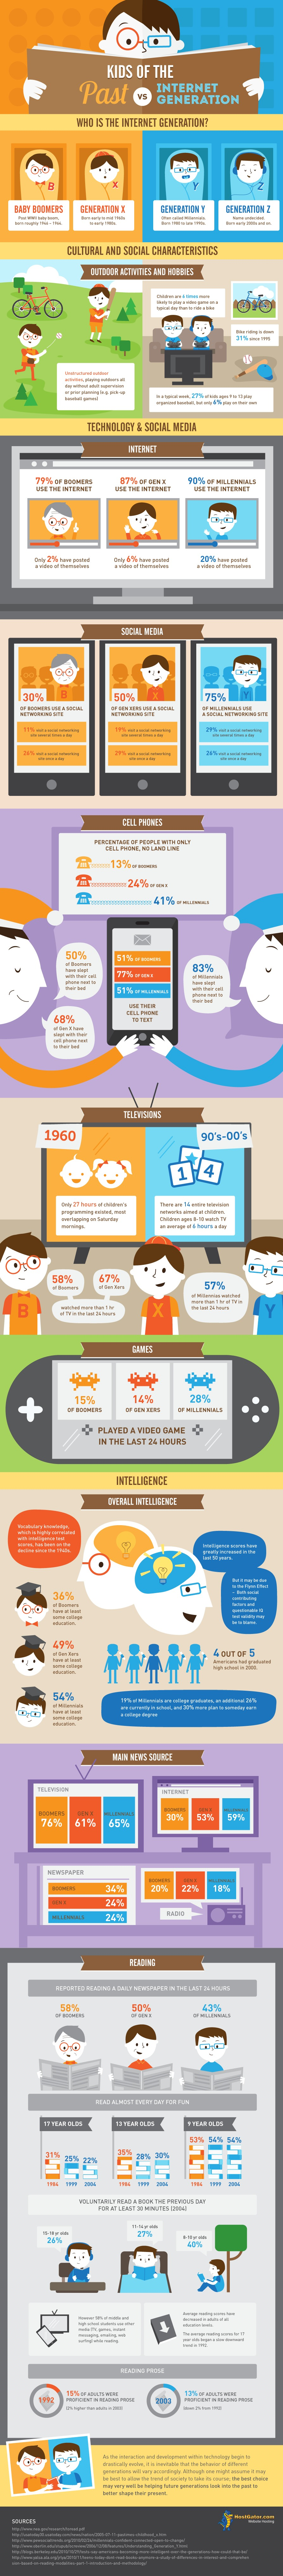 Kids Past Vs Internet Generation Social Media Infographic Infographic Online Habits